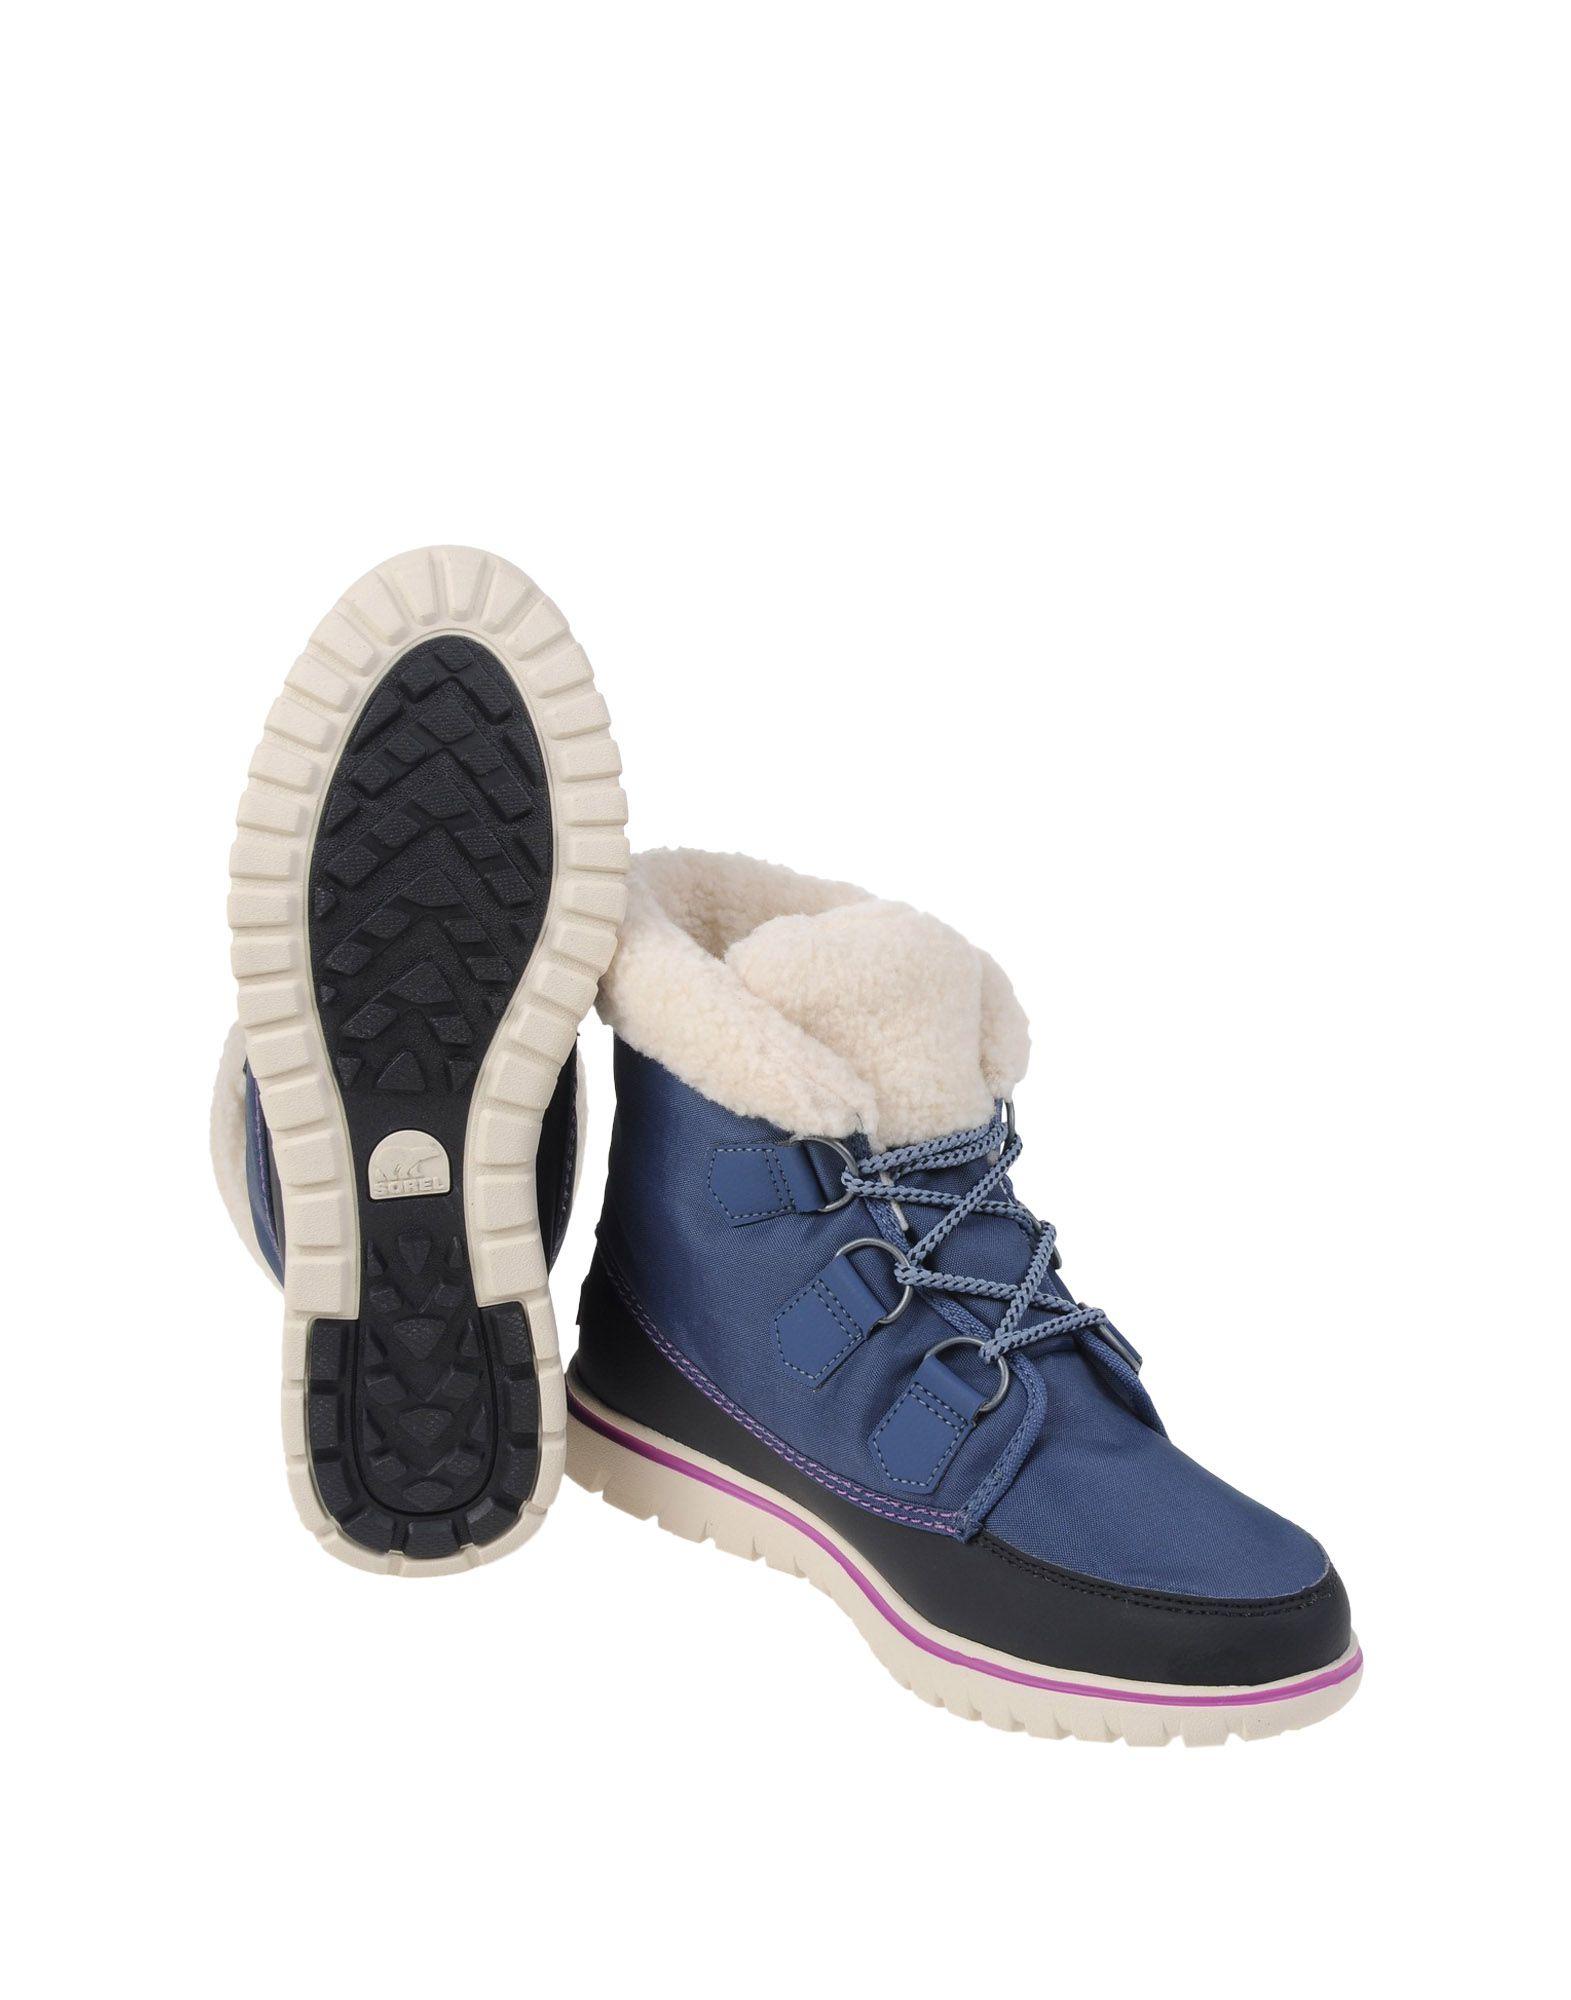 Stilvolle billige  Schuhe Sorel Cozy Carnival  billige 11102229UX dfad92